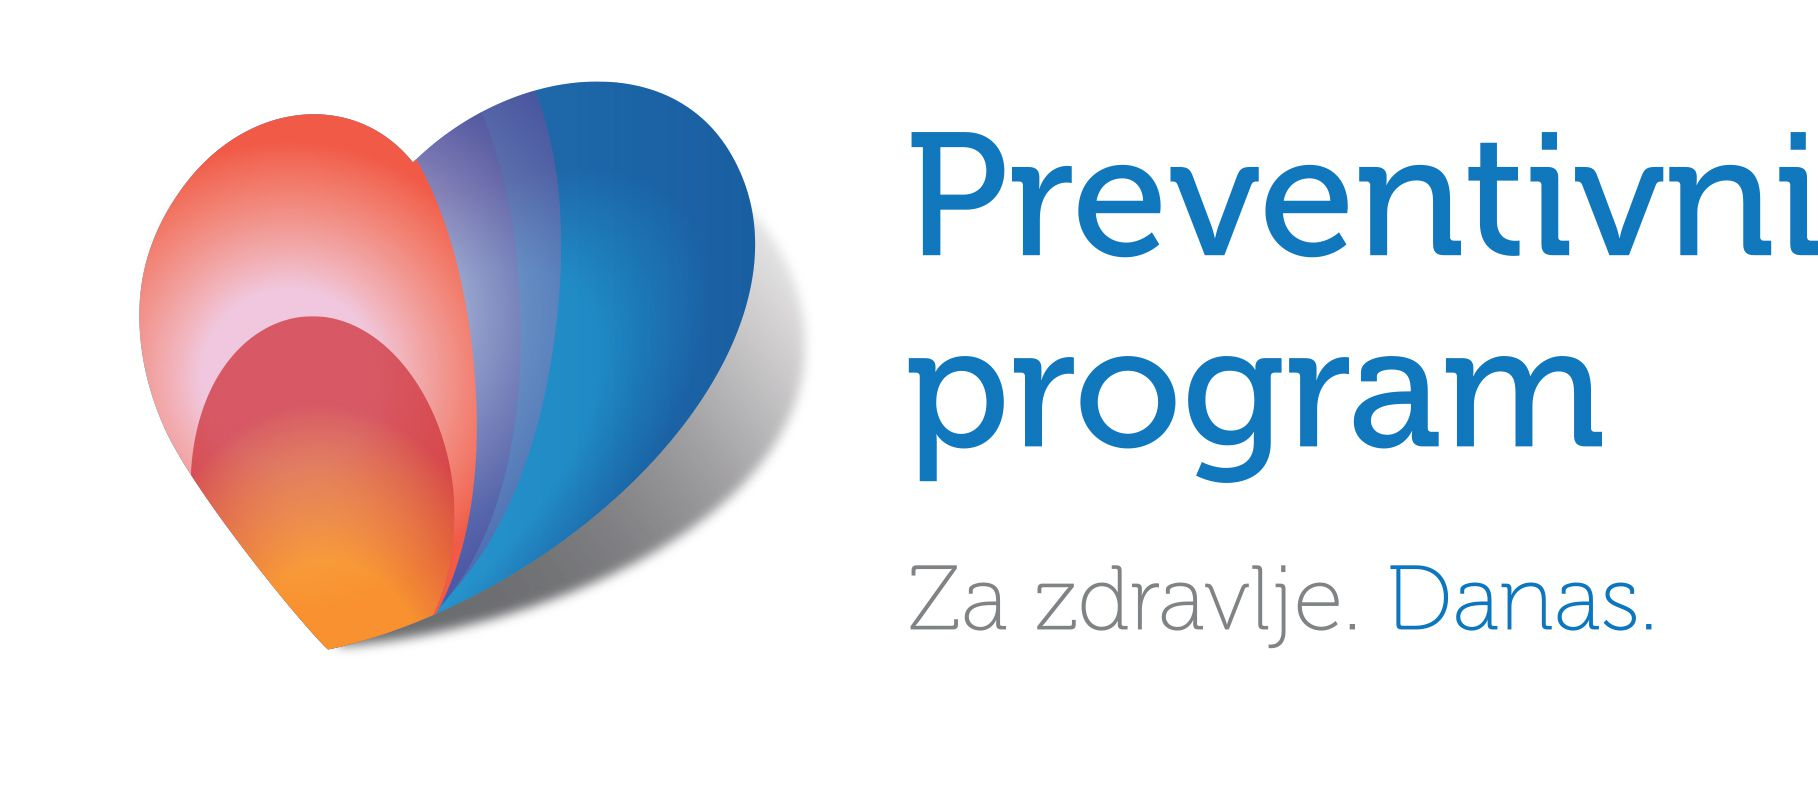 Odlazak na preventivne preglede spašava život!